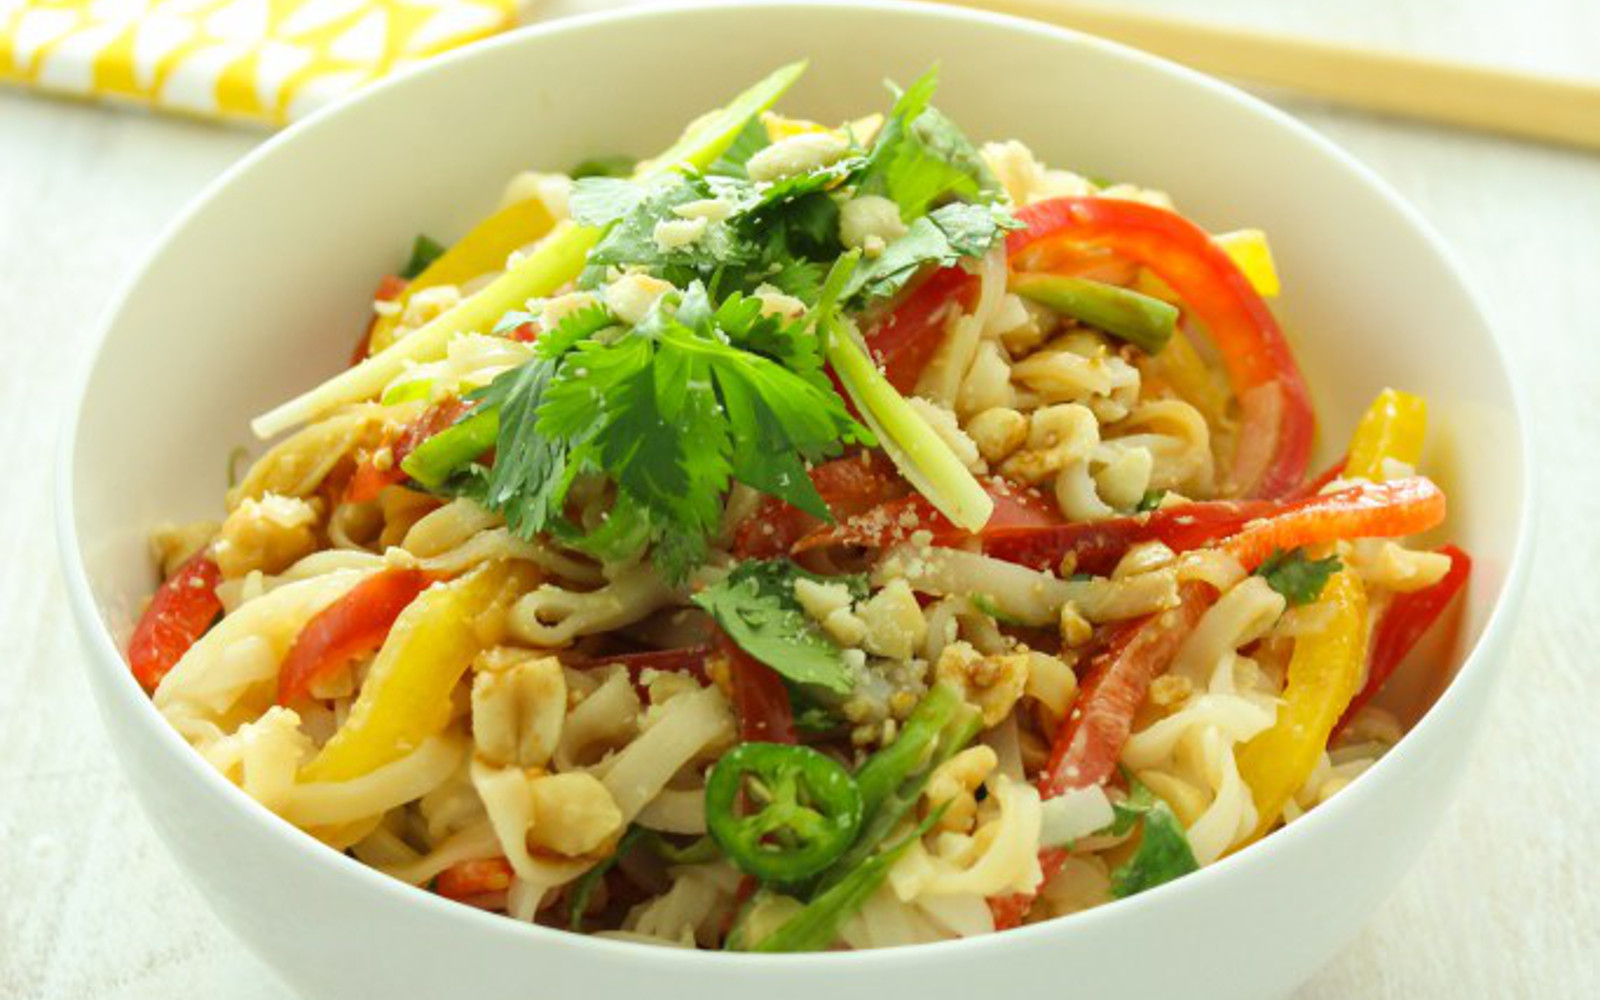 15-Minute Hot and Sour Thai Noodles